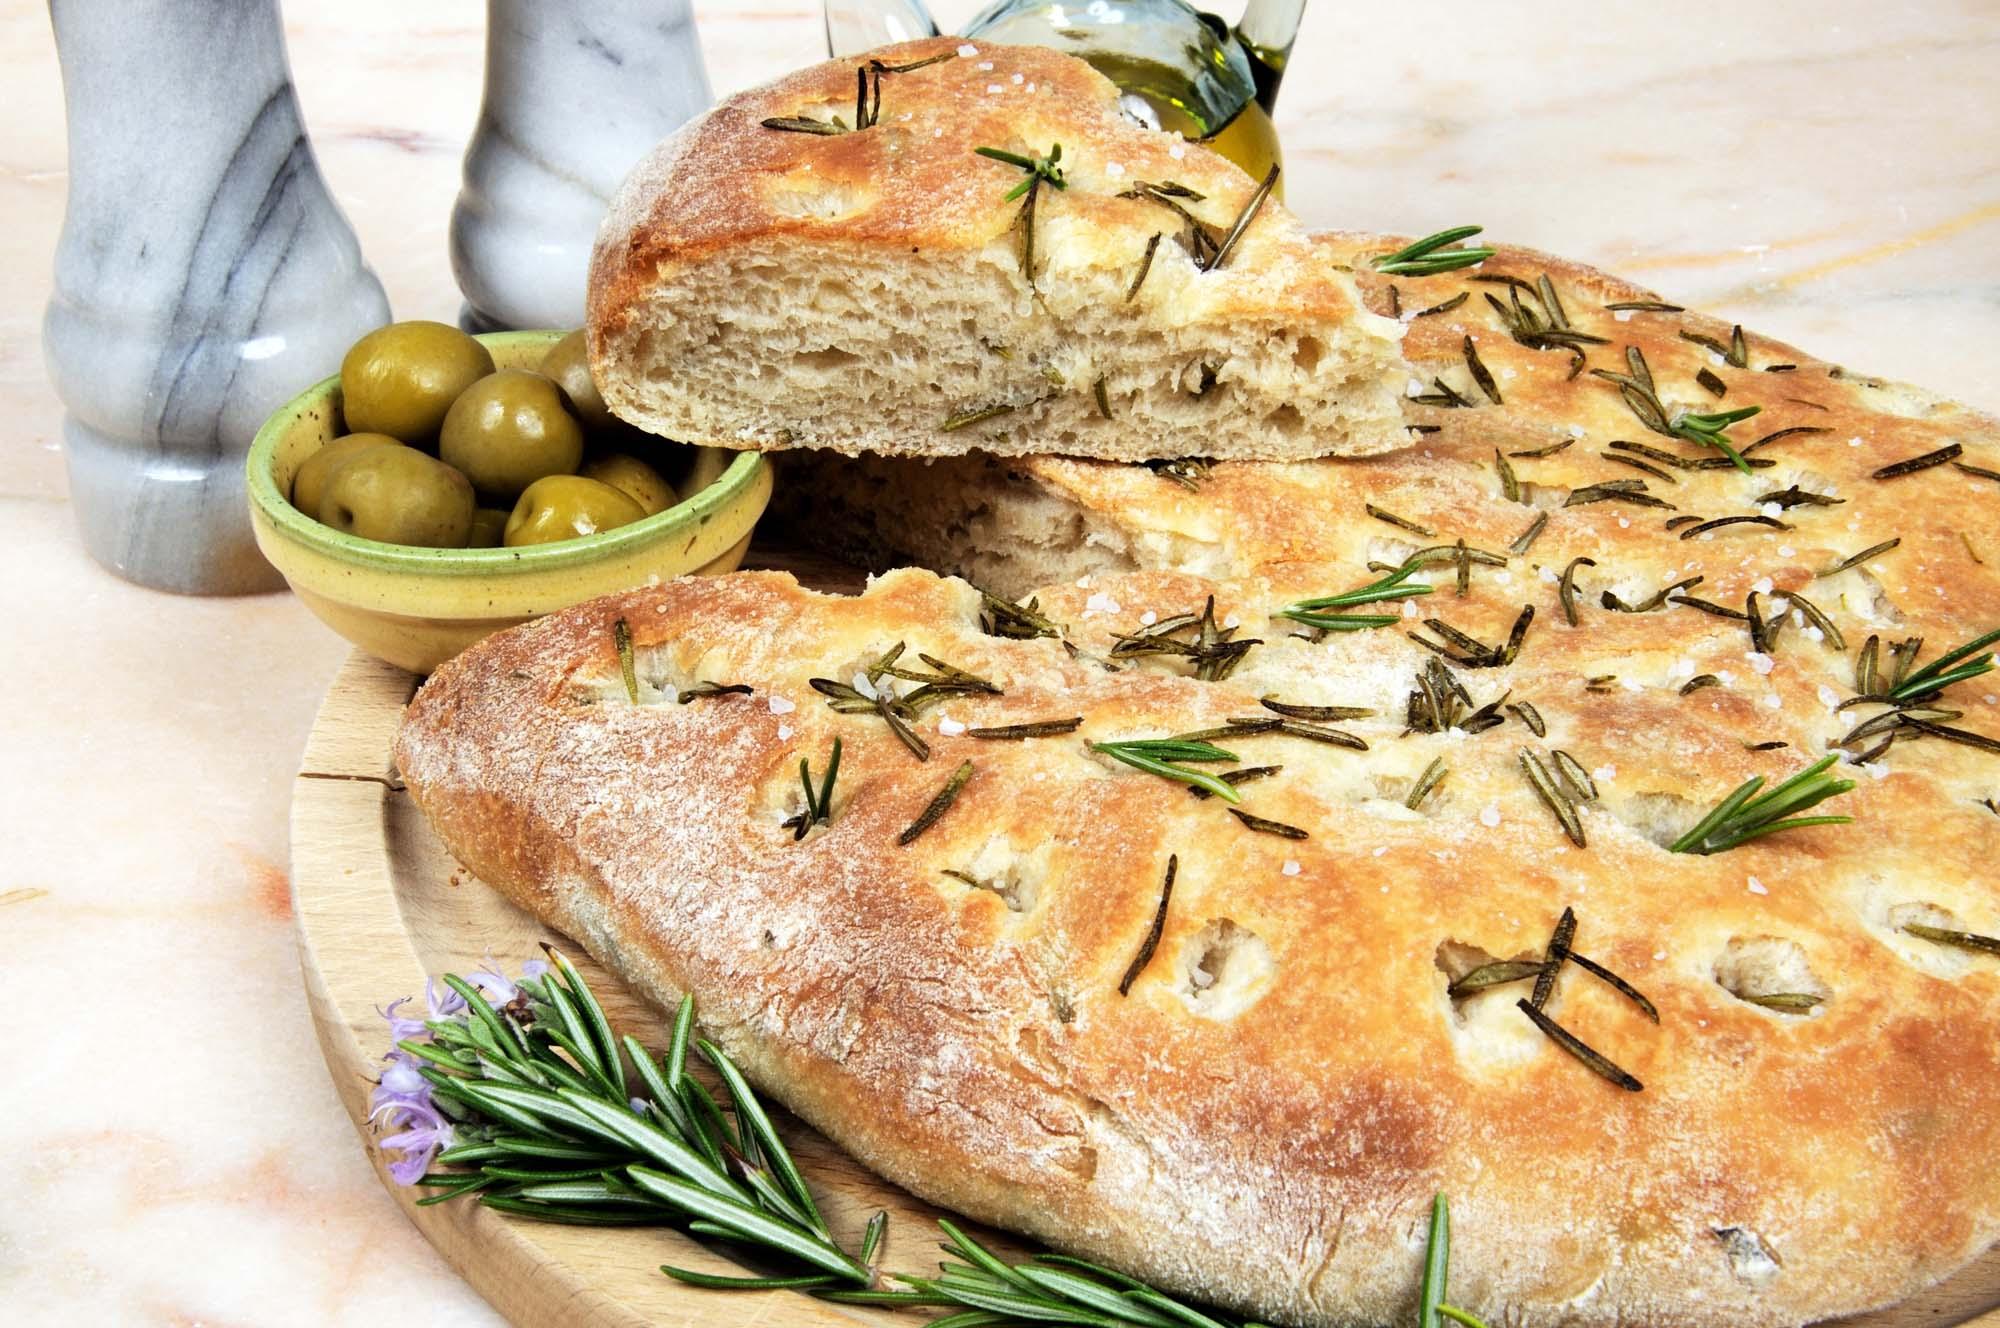 Bettina's brød med olivenolie, flagesalt og krydderier